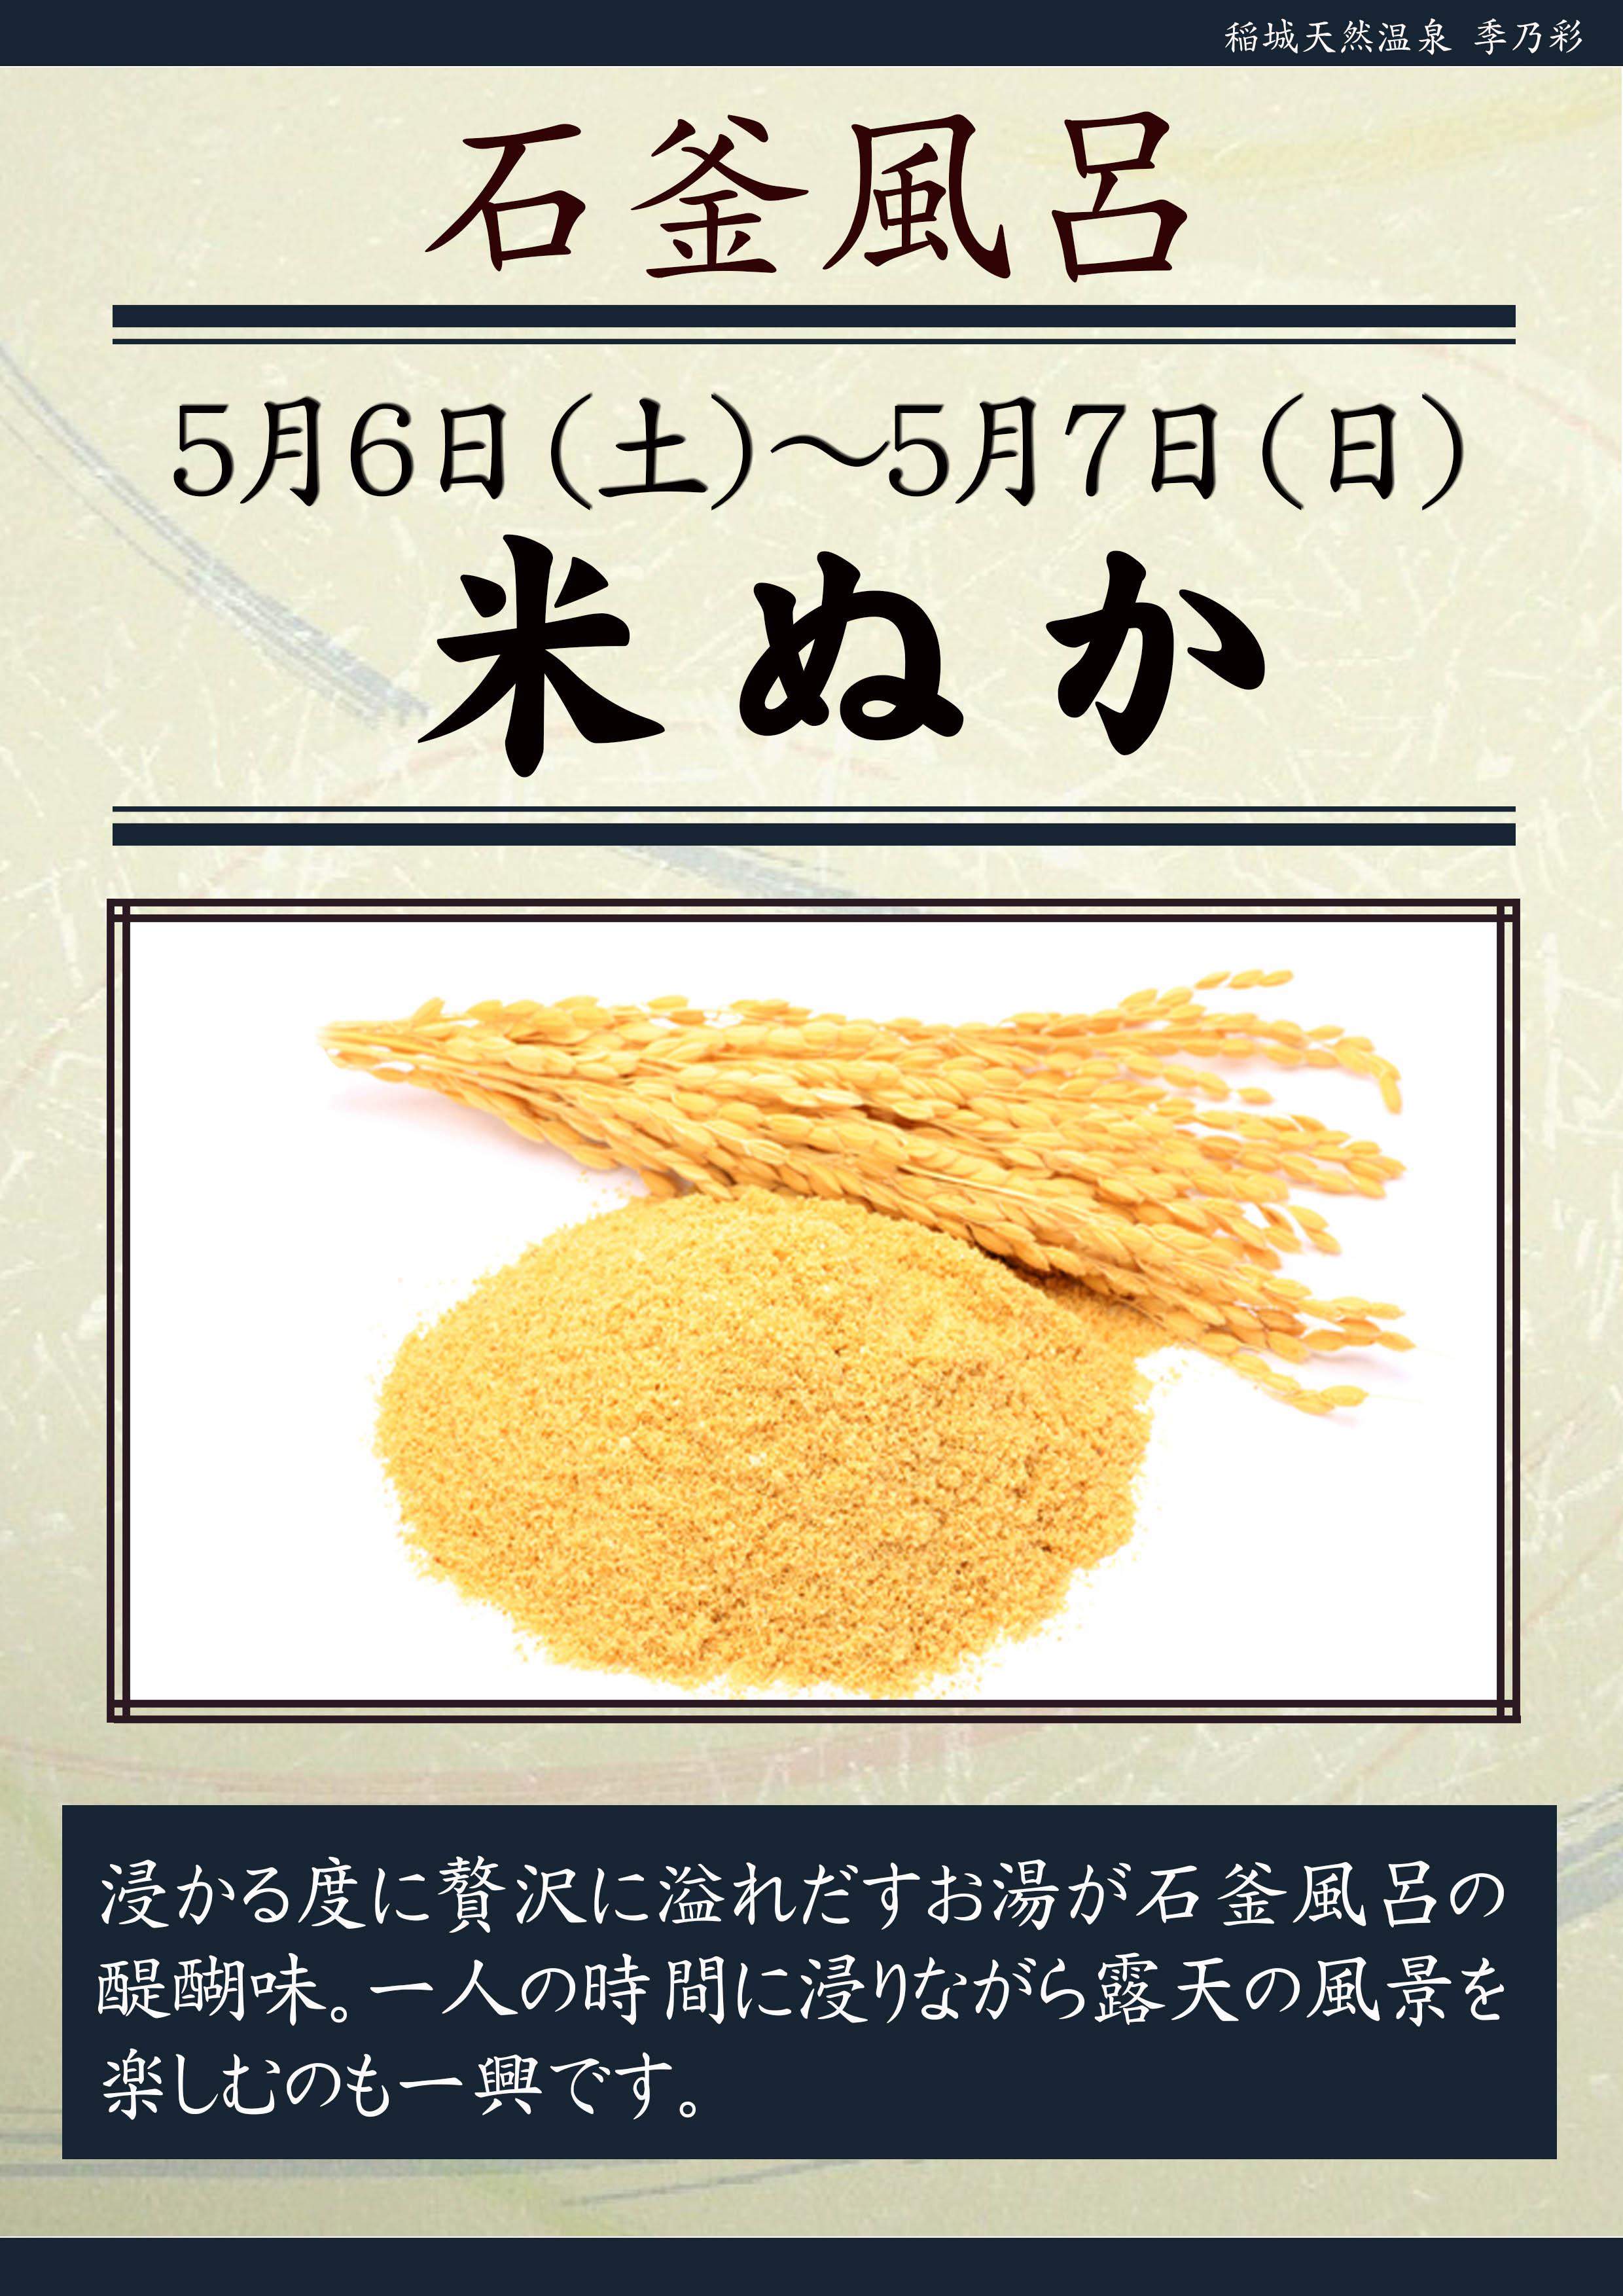 20170506POP 石釜風呂 米ぬか